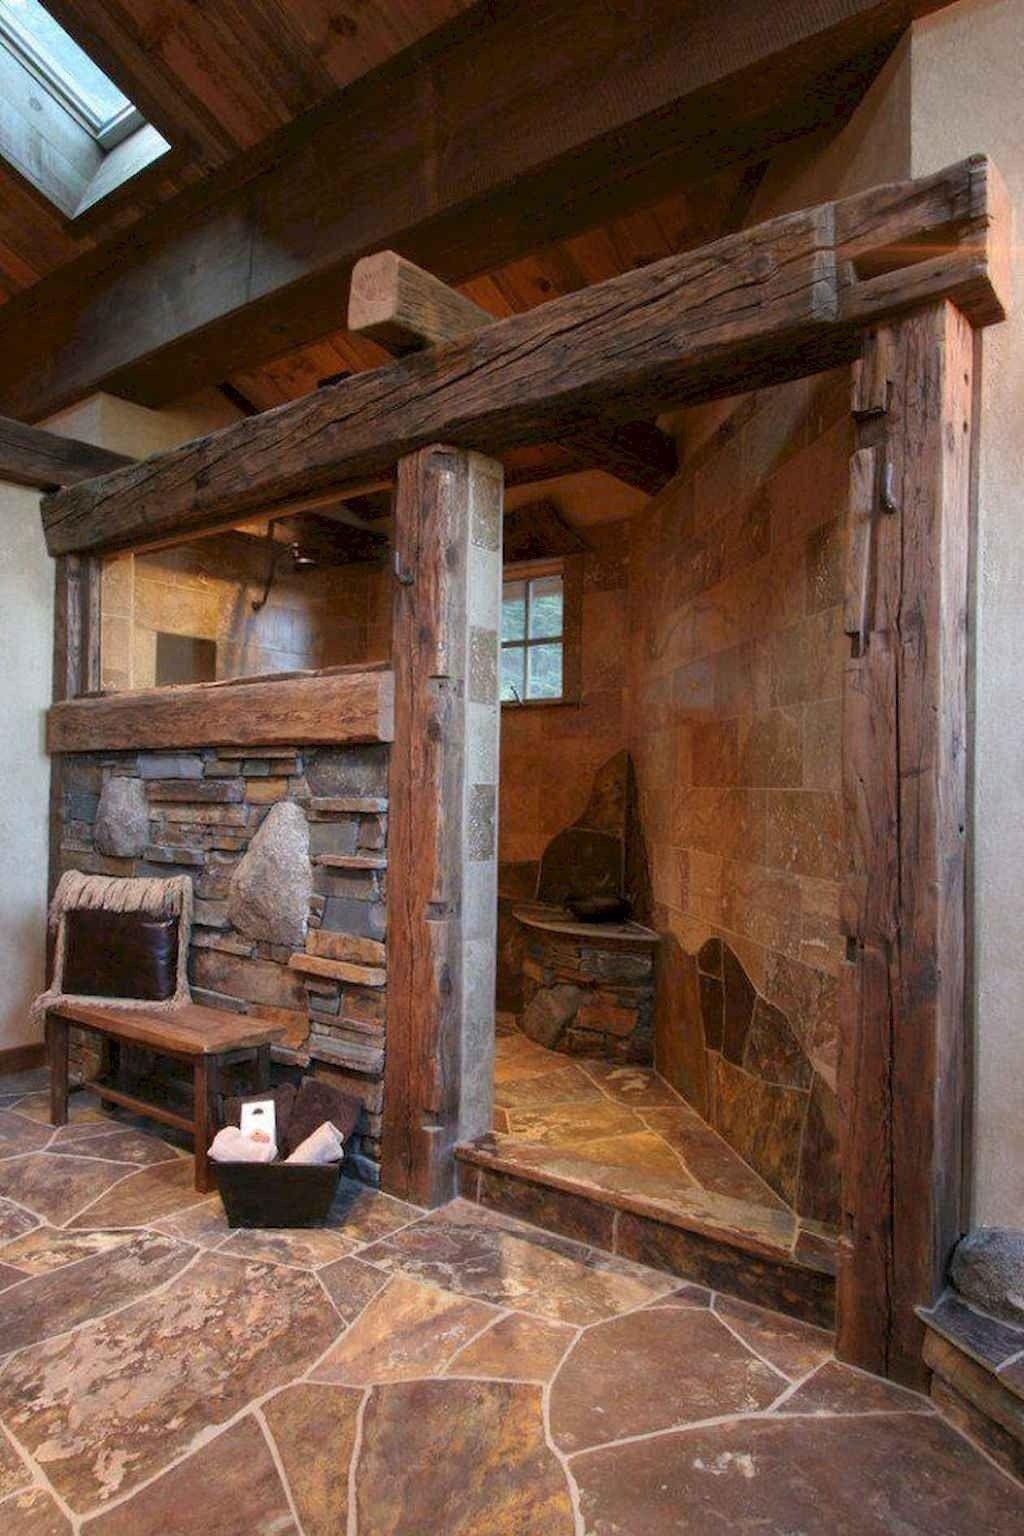 80 Best Farmhouse Tile Shower Ideas Remodel in 2020 ... on Rustic Farmhouse Bathroom Tile  id=92769